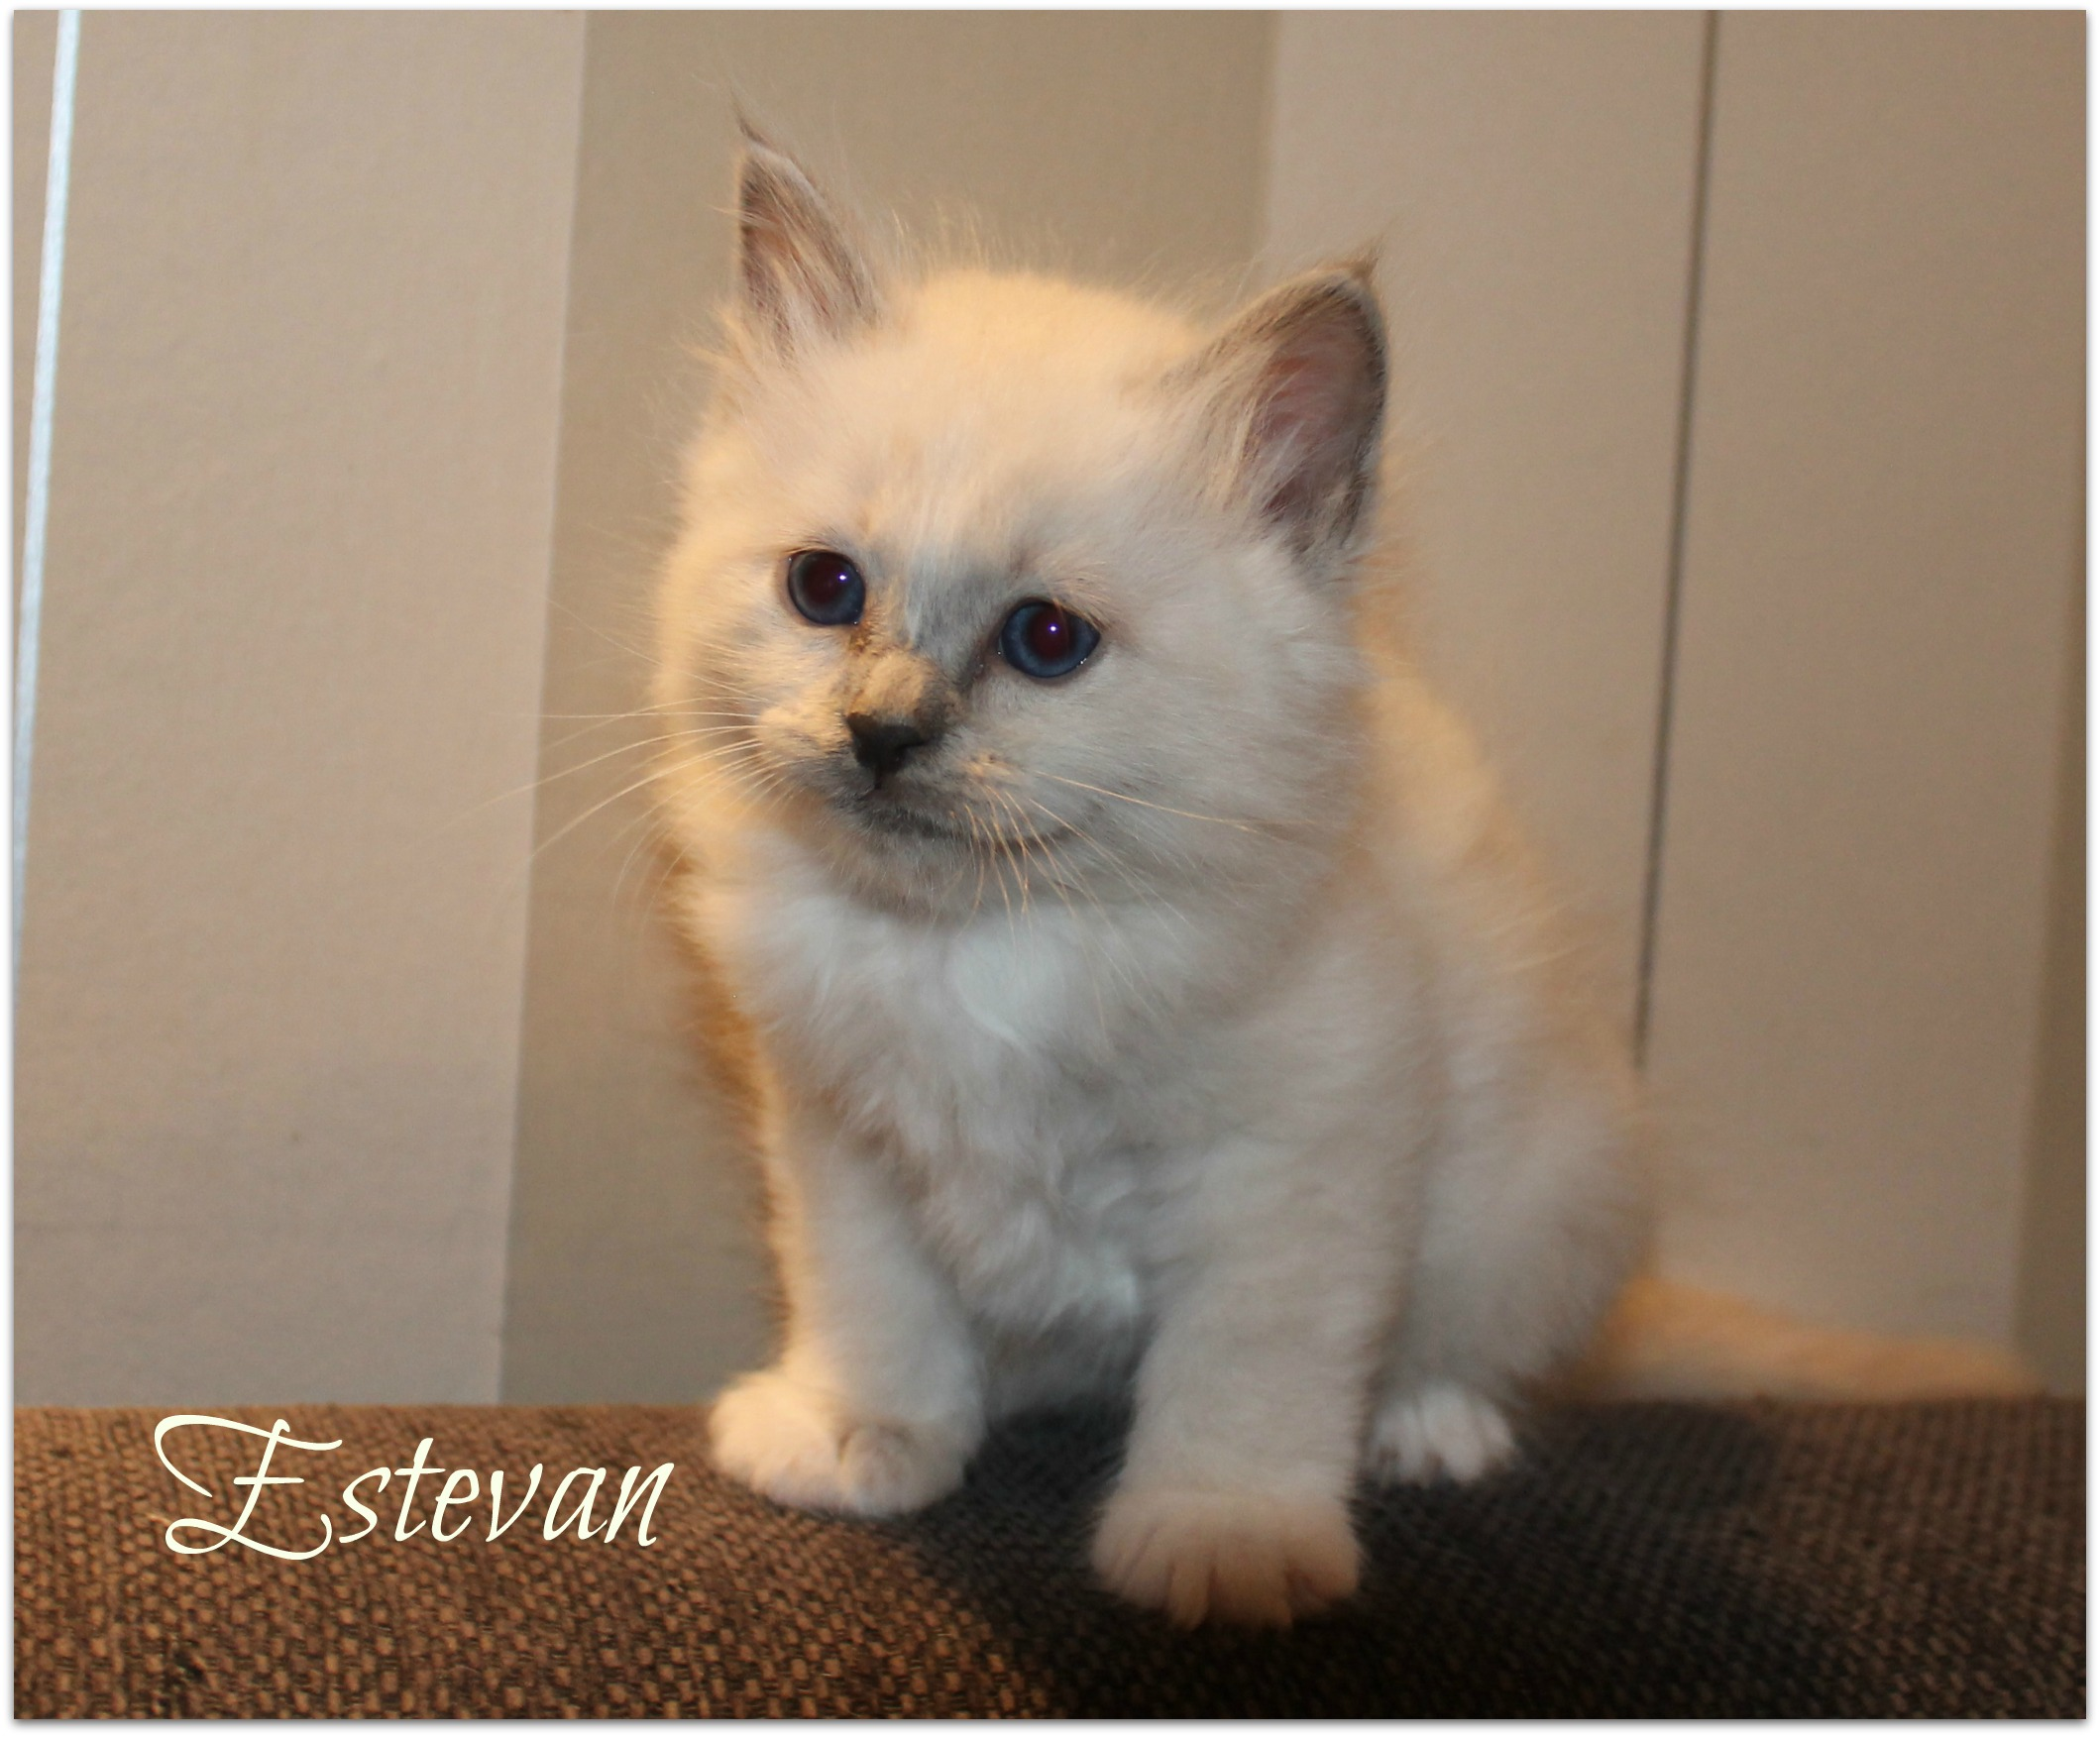 estevan_0